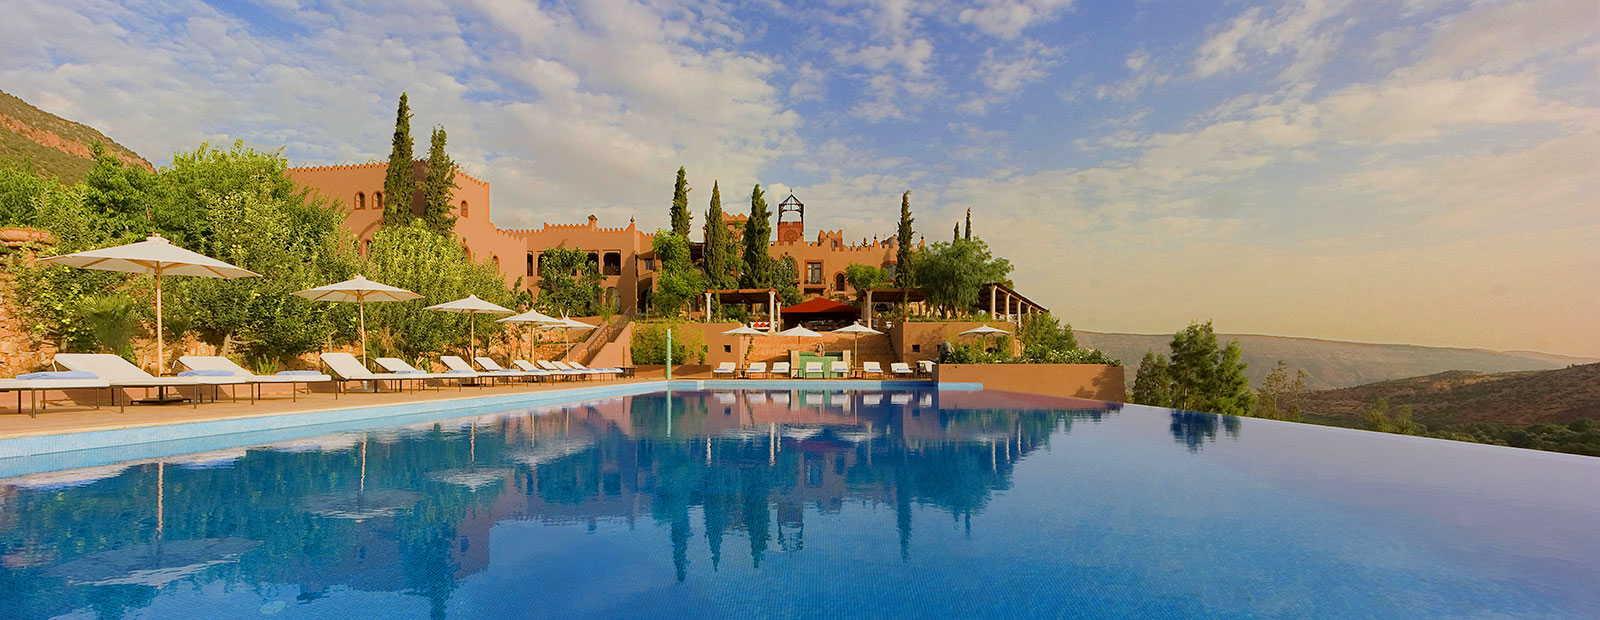 exklusive hotels marokko designhotels mit spa marokko mieten